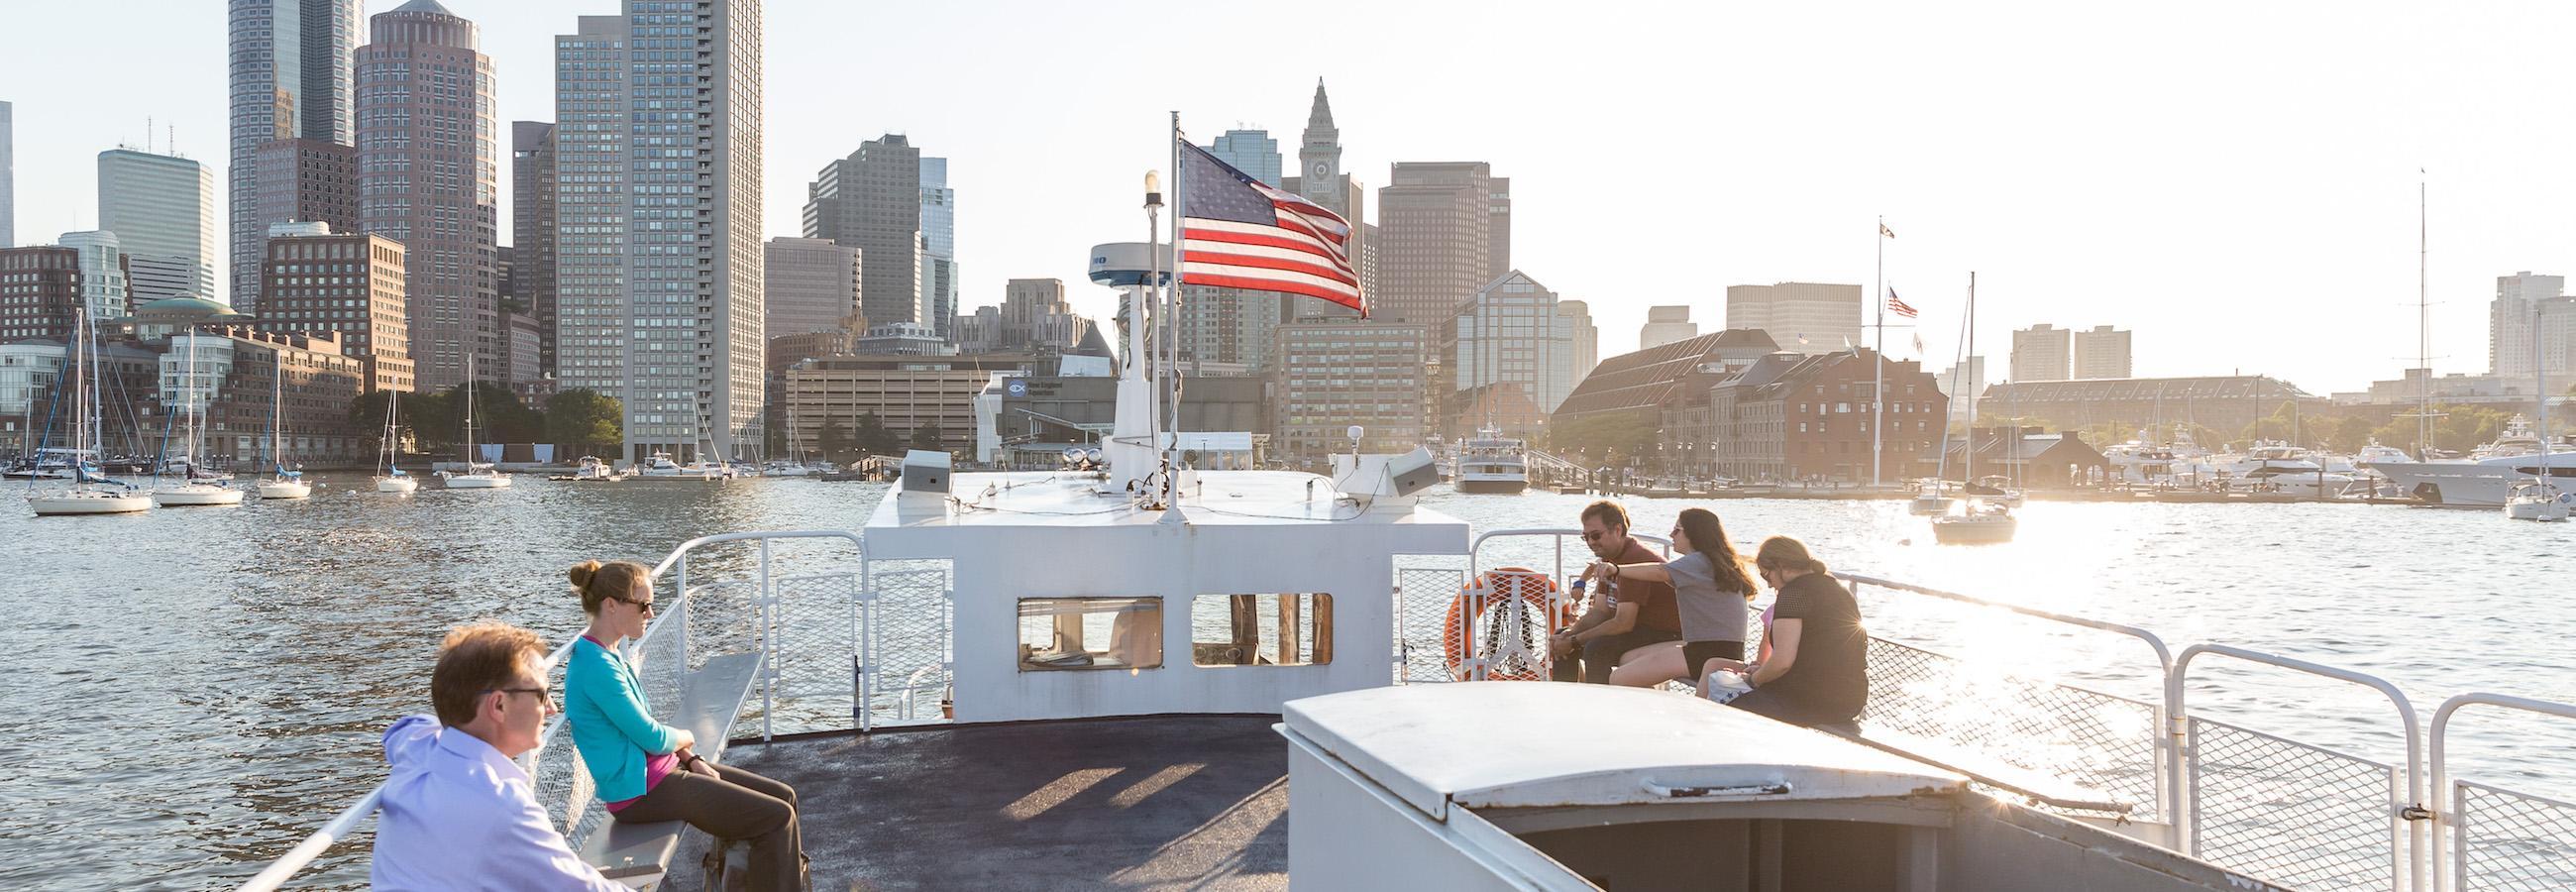 boston harbor skyline from ferry